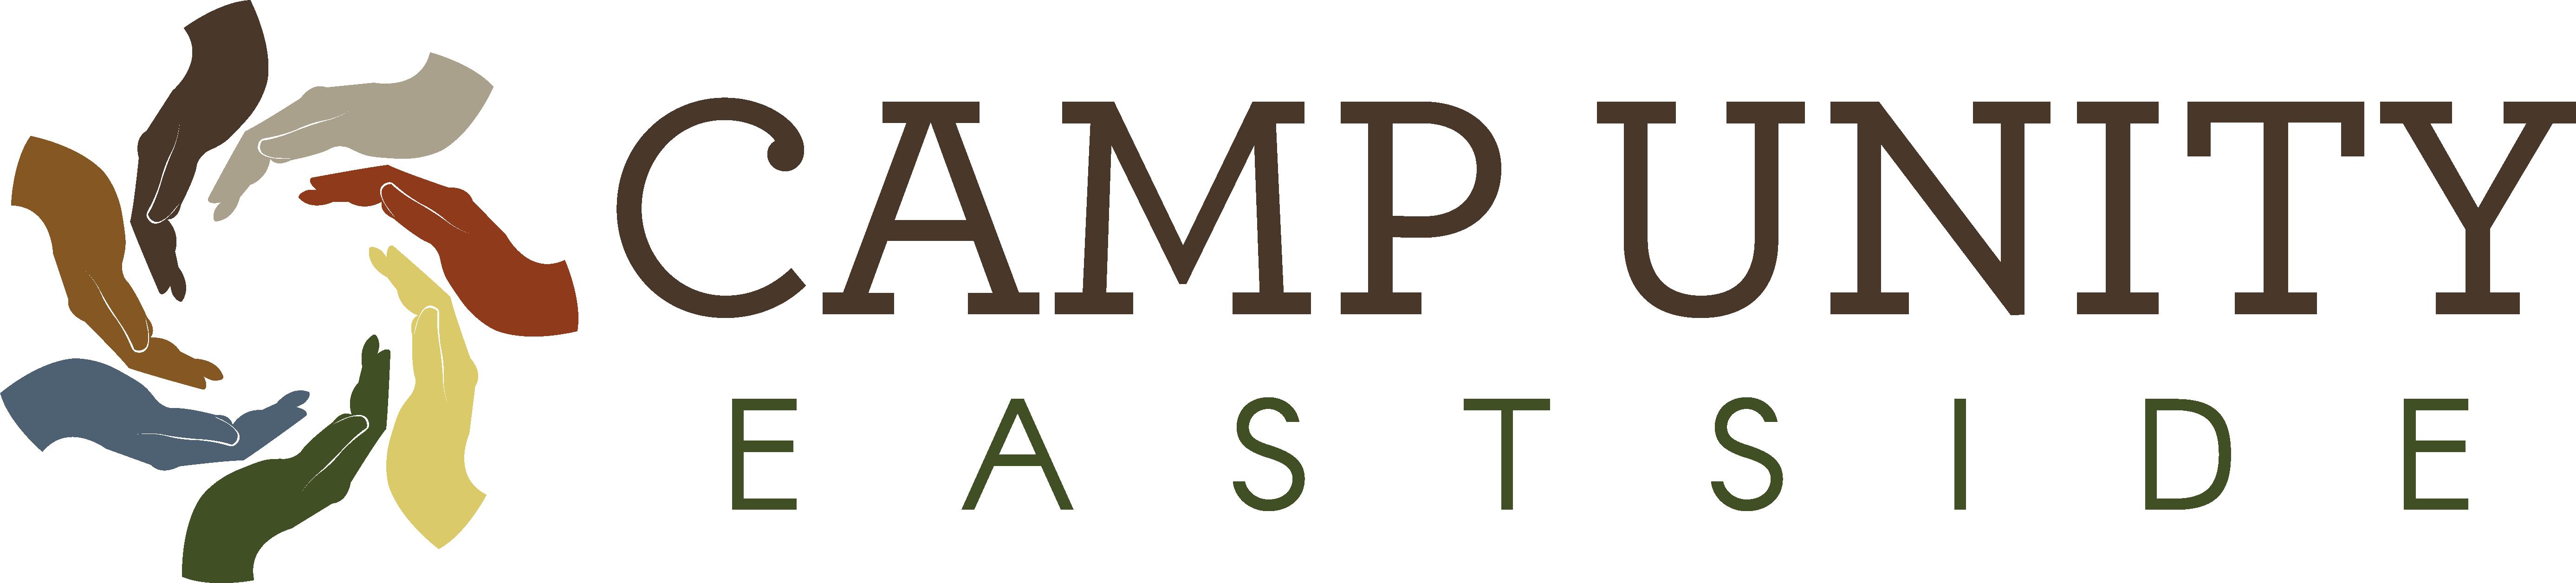 Clipart tent encampment. Camp unity eastside